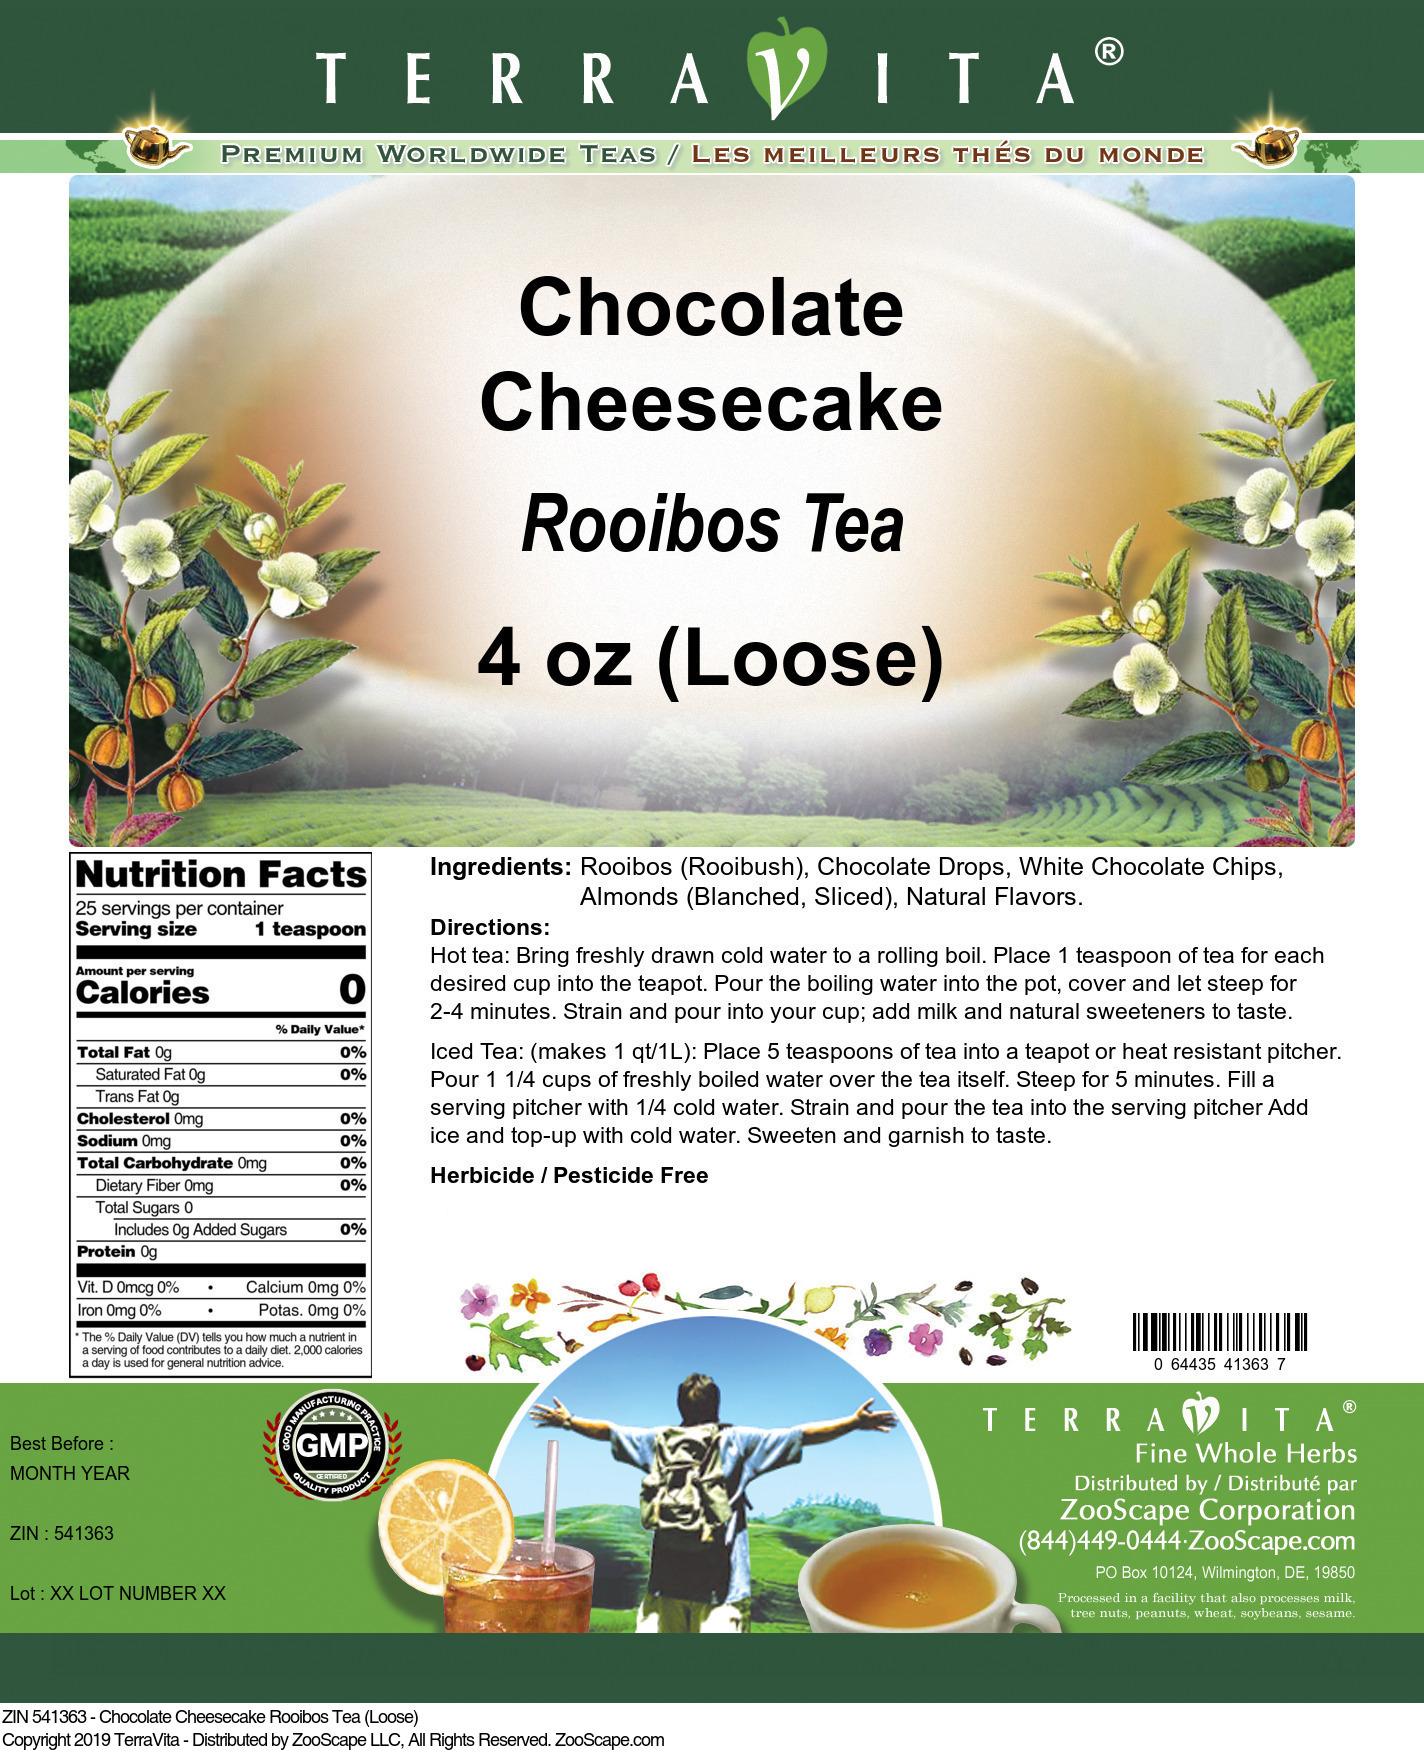 Chocolate Cheesecake Rooibos Tea (Loose)